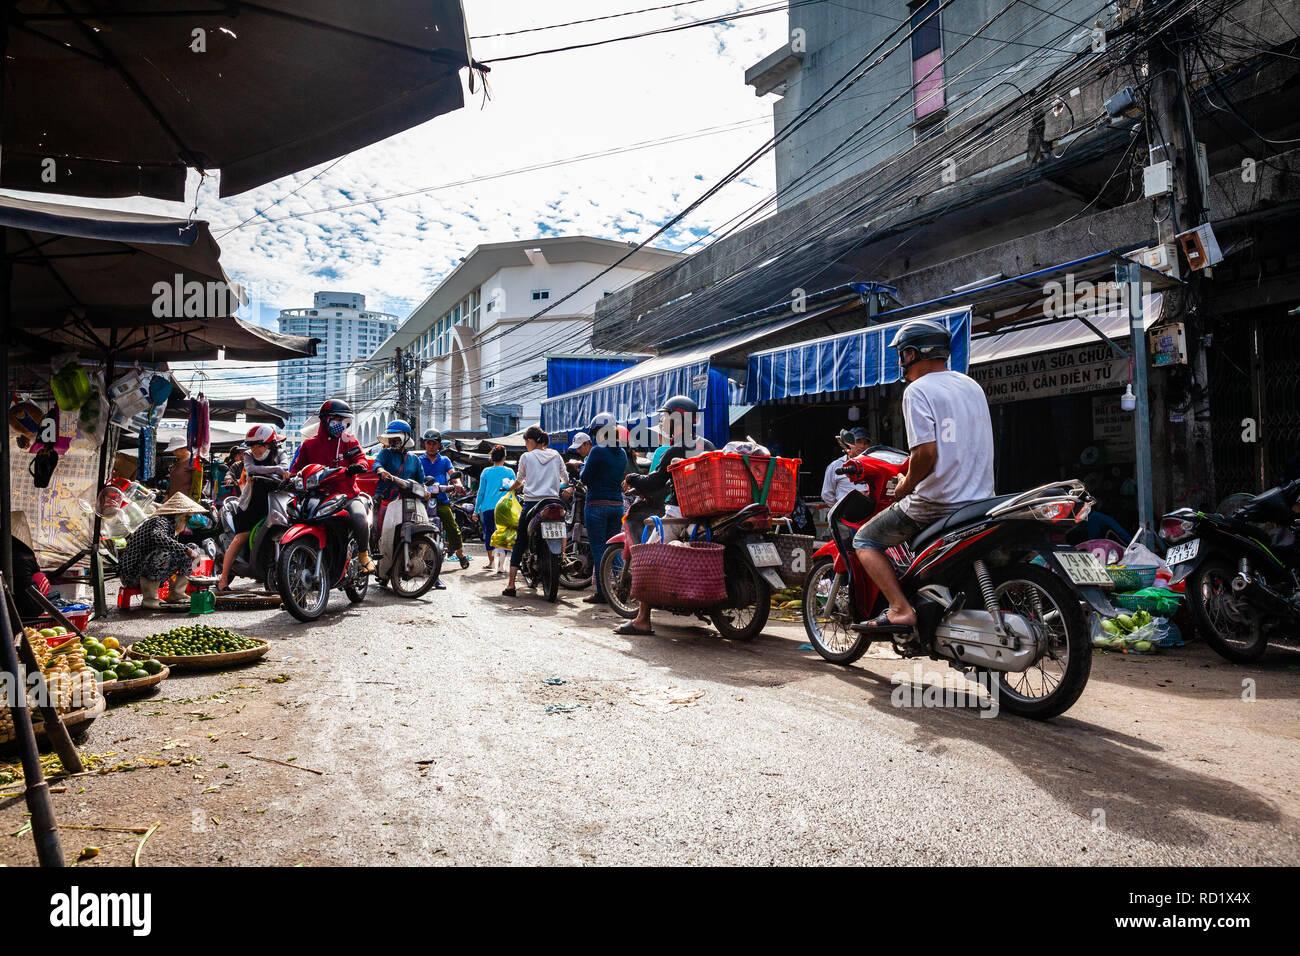 NHA TRANG, VIETNAM - 12. SEPTEMBER: Typische morgen Stau am Cho Dam Markt in Nha Trang am 12. September 2018 in Nha Trang, Vietnam. Stockbild